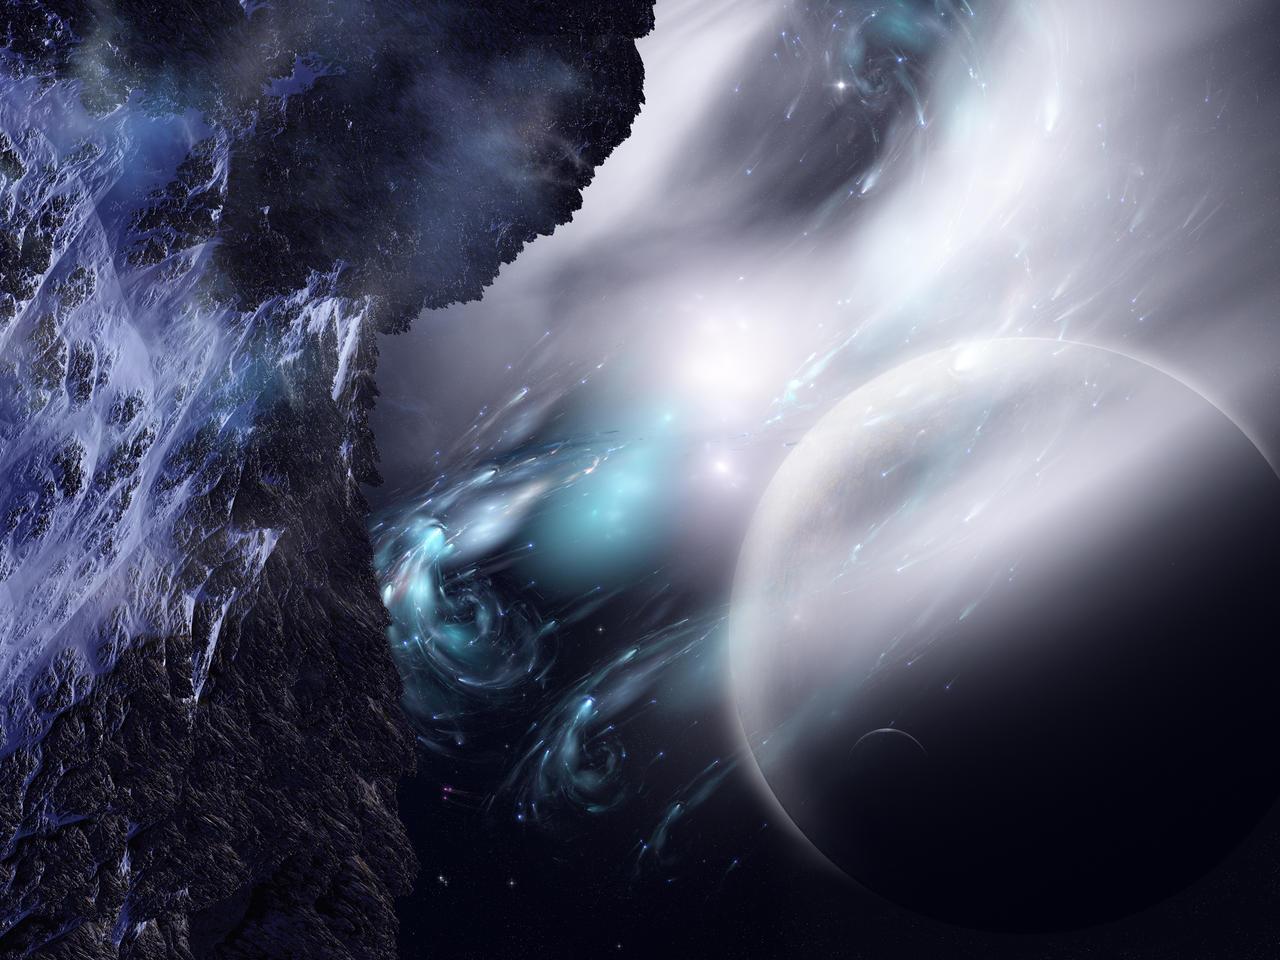 Mt. Hood Moon Cygnus Sector by Casperium